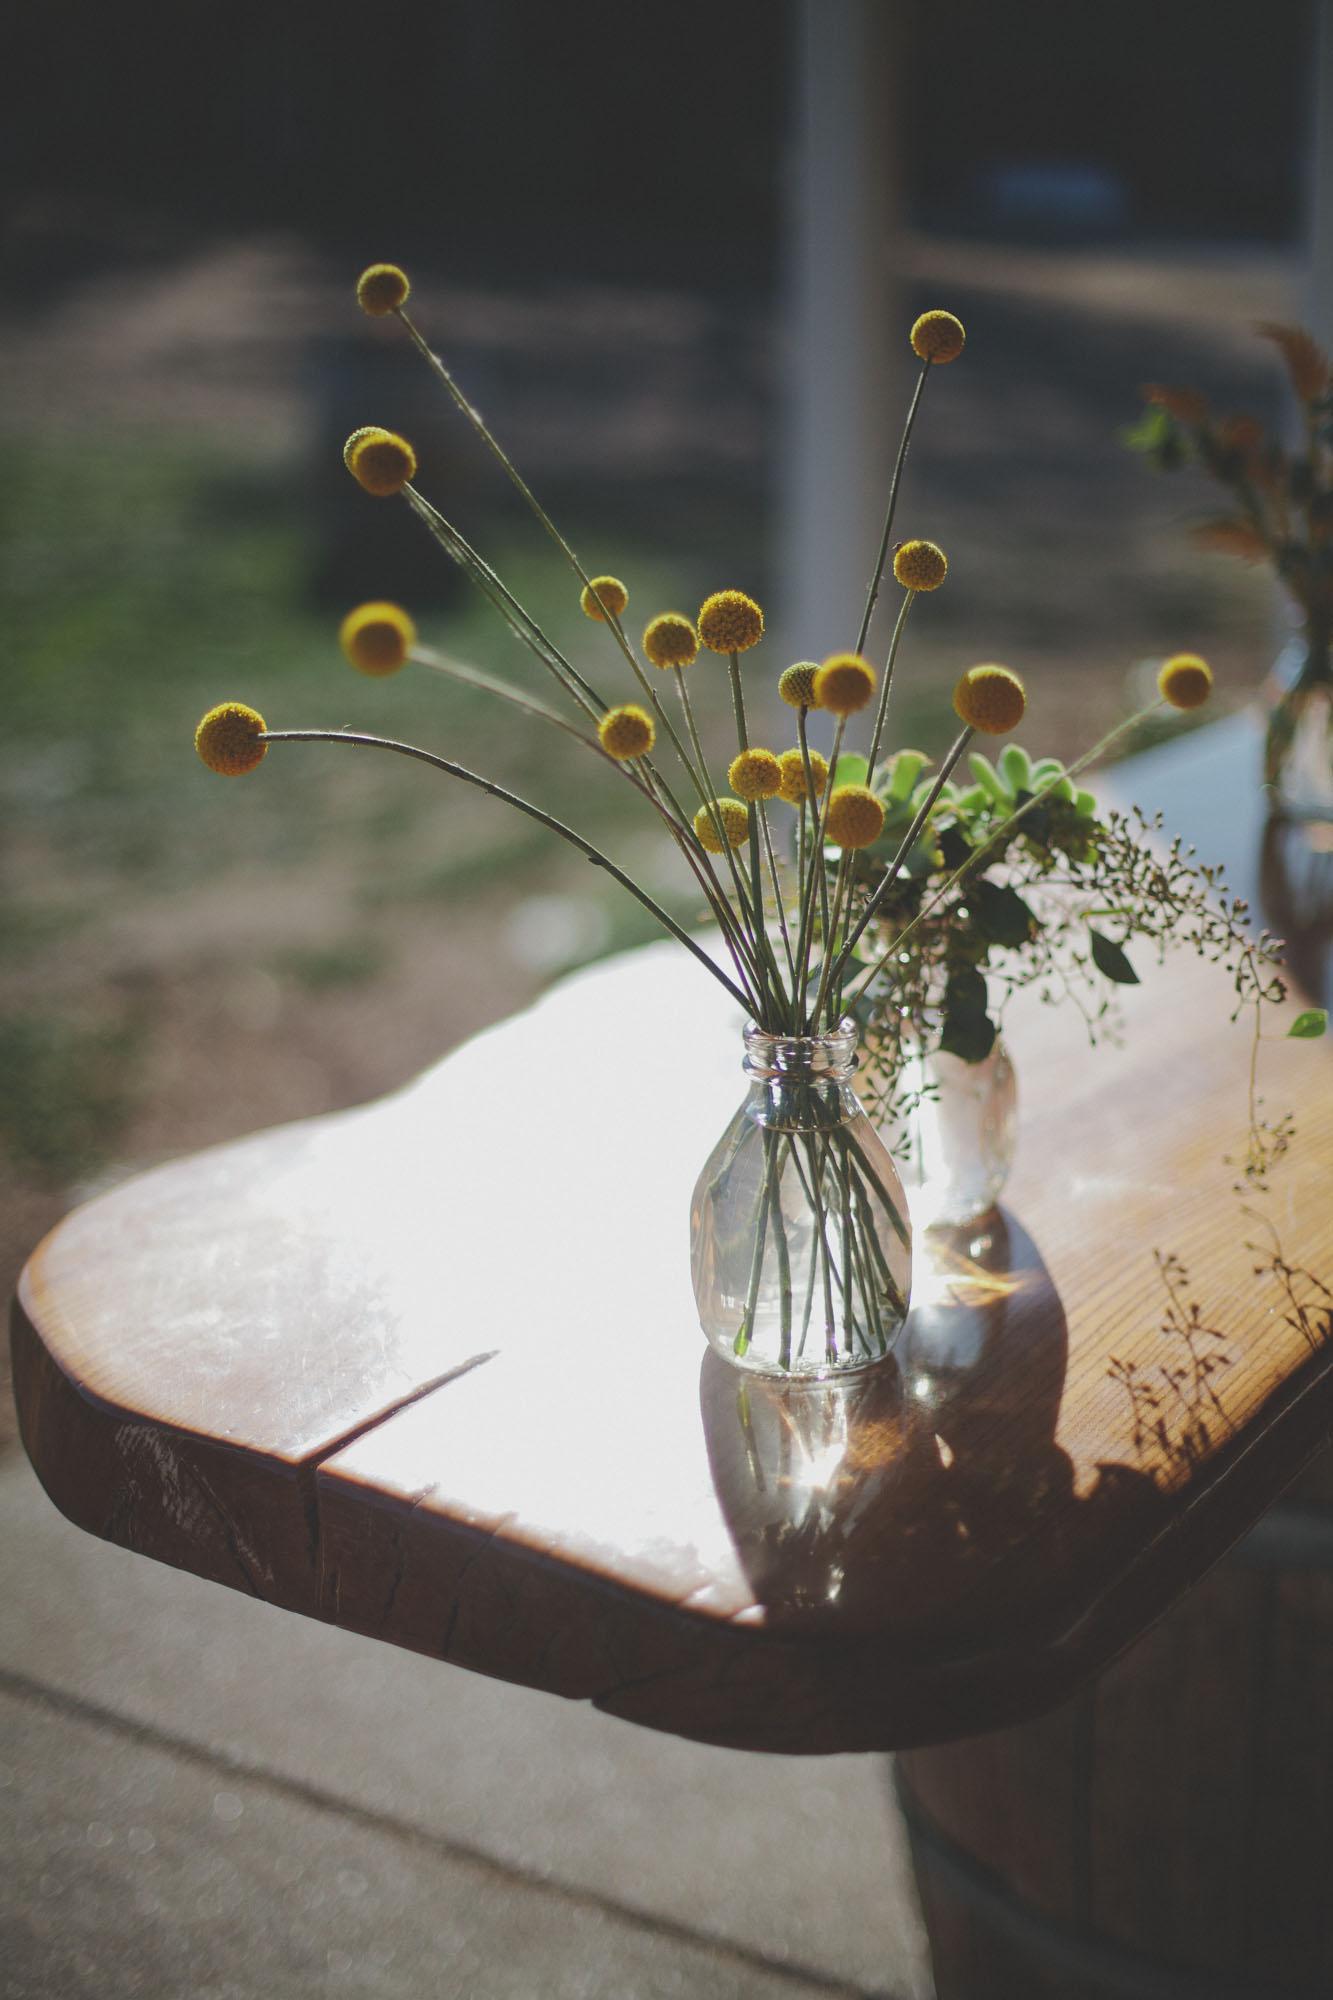 Gretchen_Gause_Petaluma_Olympias_Valley_Wedding_Photo-136.jpg